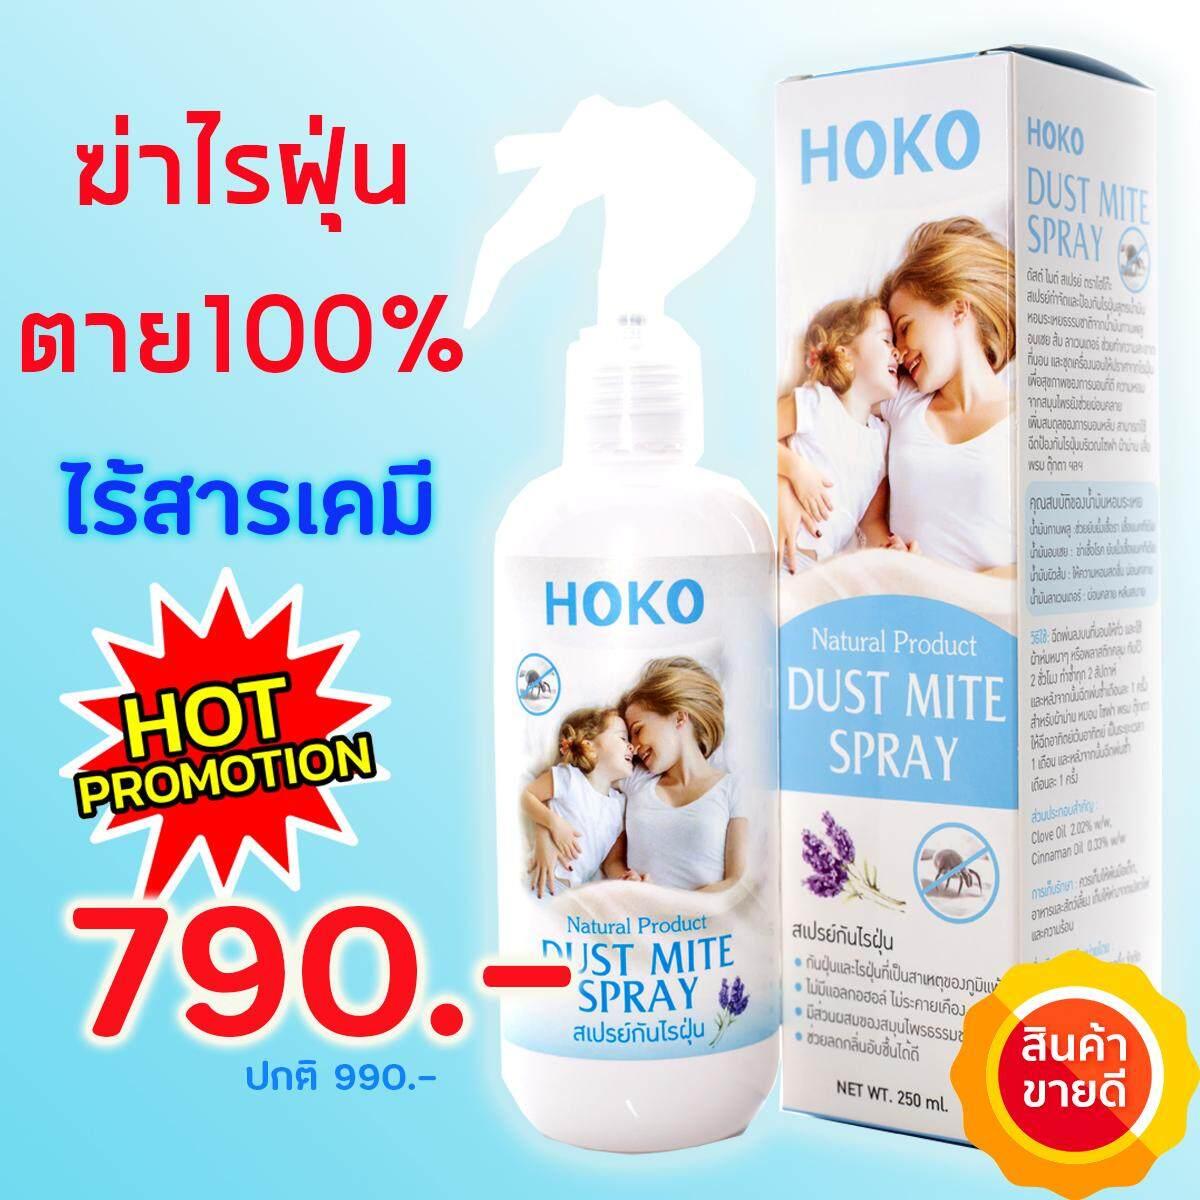 Hoko สเปรย์กำจัดไรฝุ่น 100%  Hoko Dust Mite Spray  ขนาด 250ml.